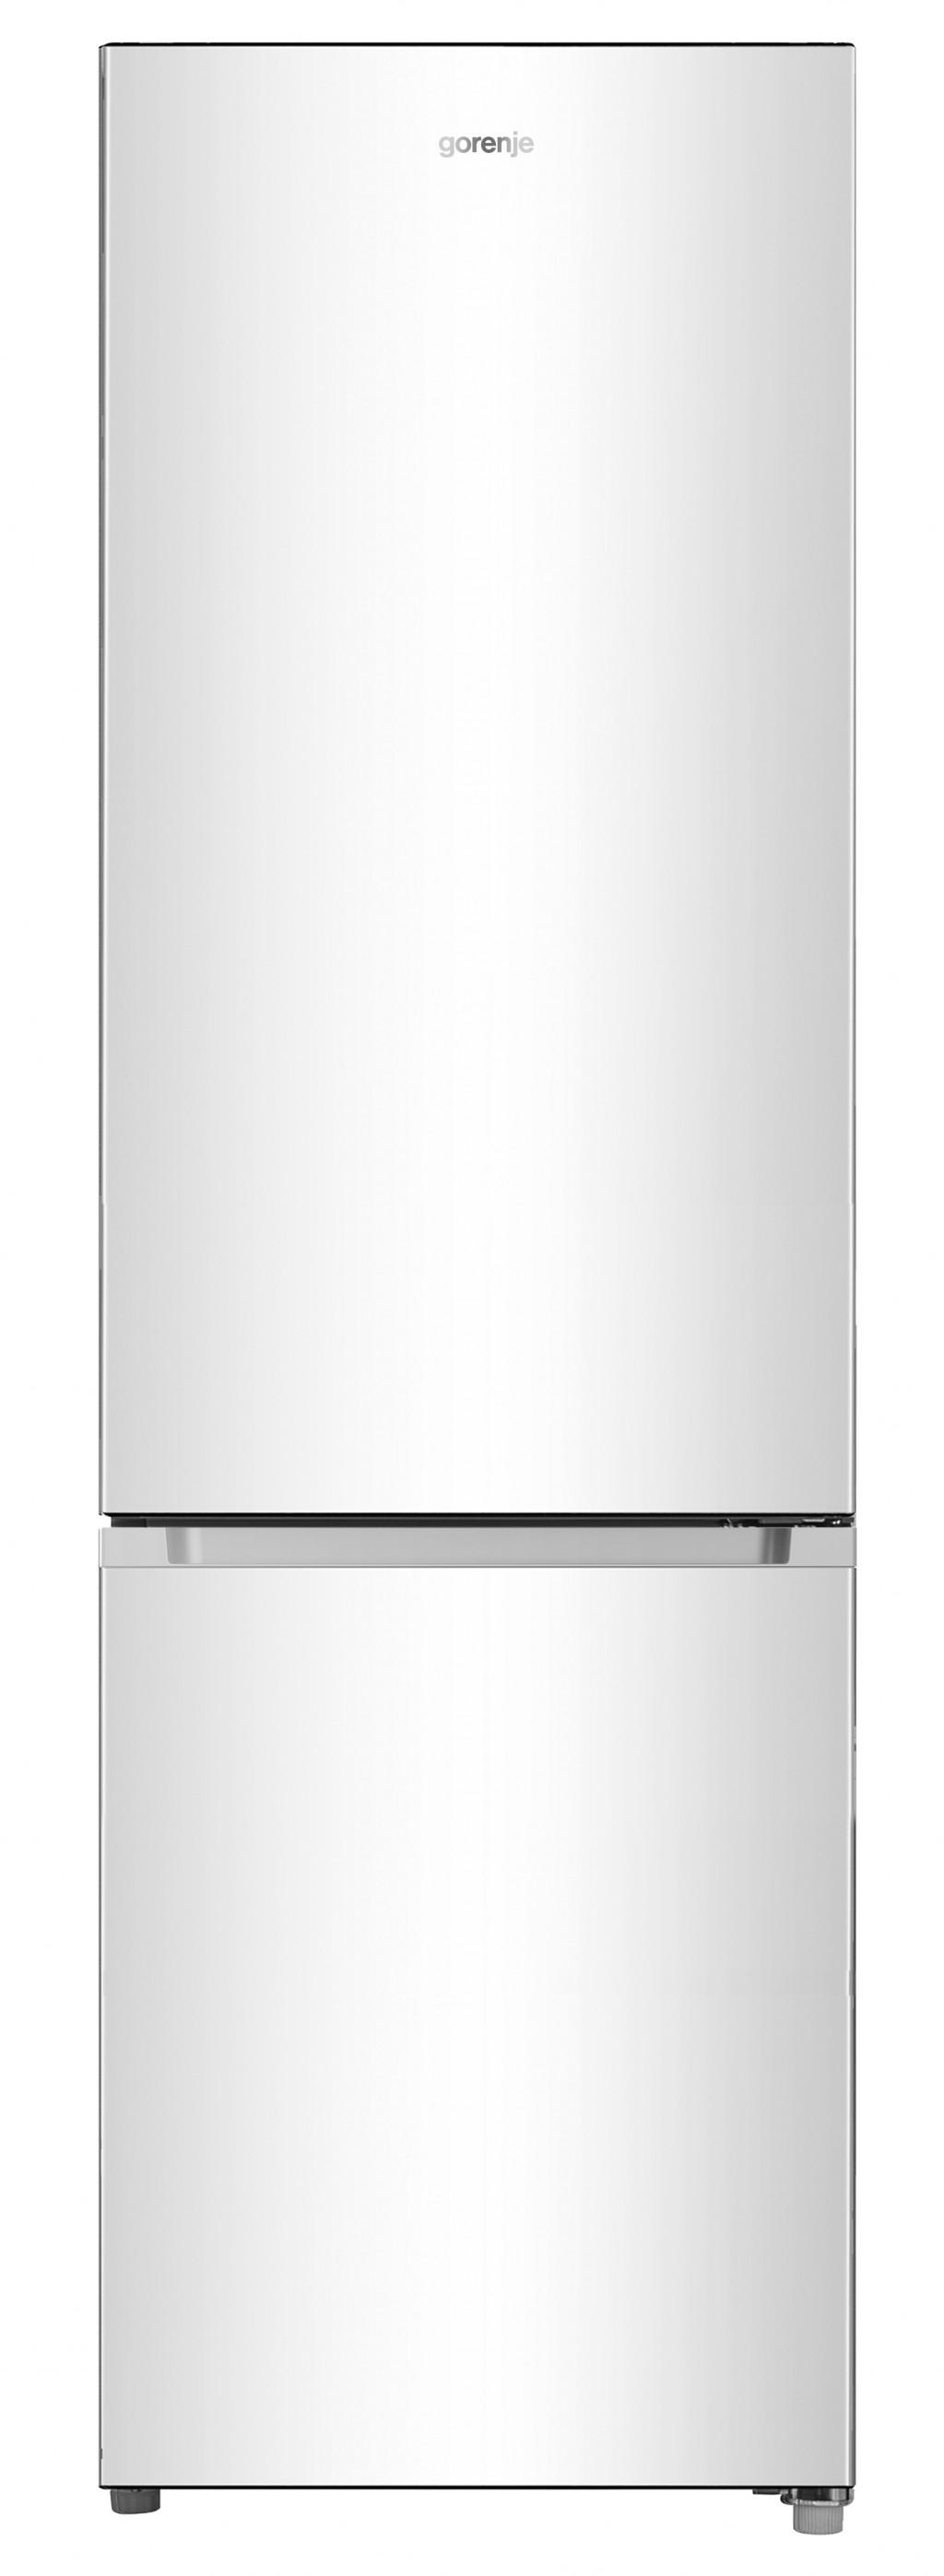 Gorenje Refrigerator RK4181PW4 Energy efficiency class F, Free standing, Combi, Height 180 cm, Fridge net capacity 198 L, Freezer net capacity 71 L, 39 dB, White